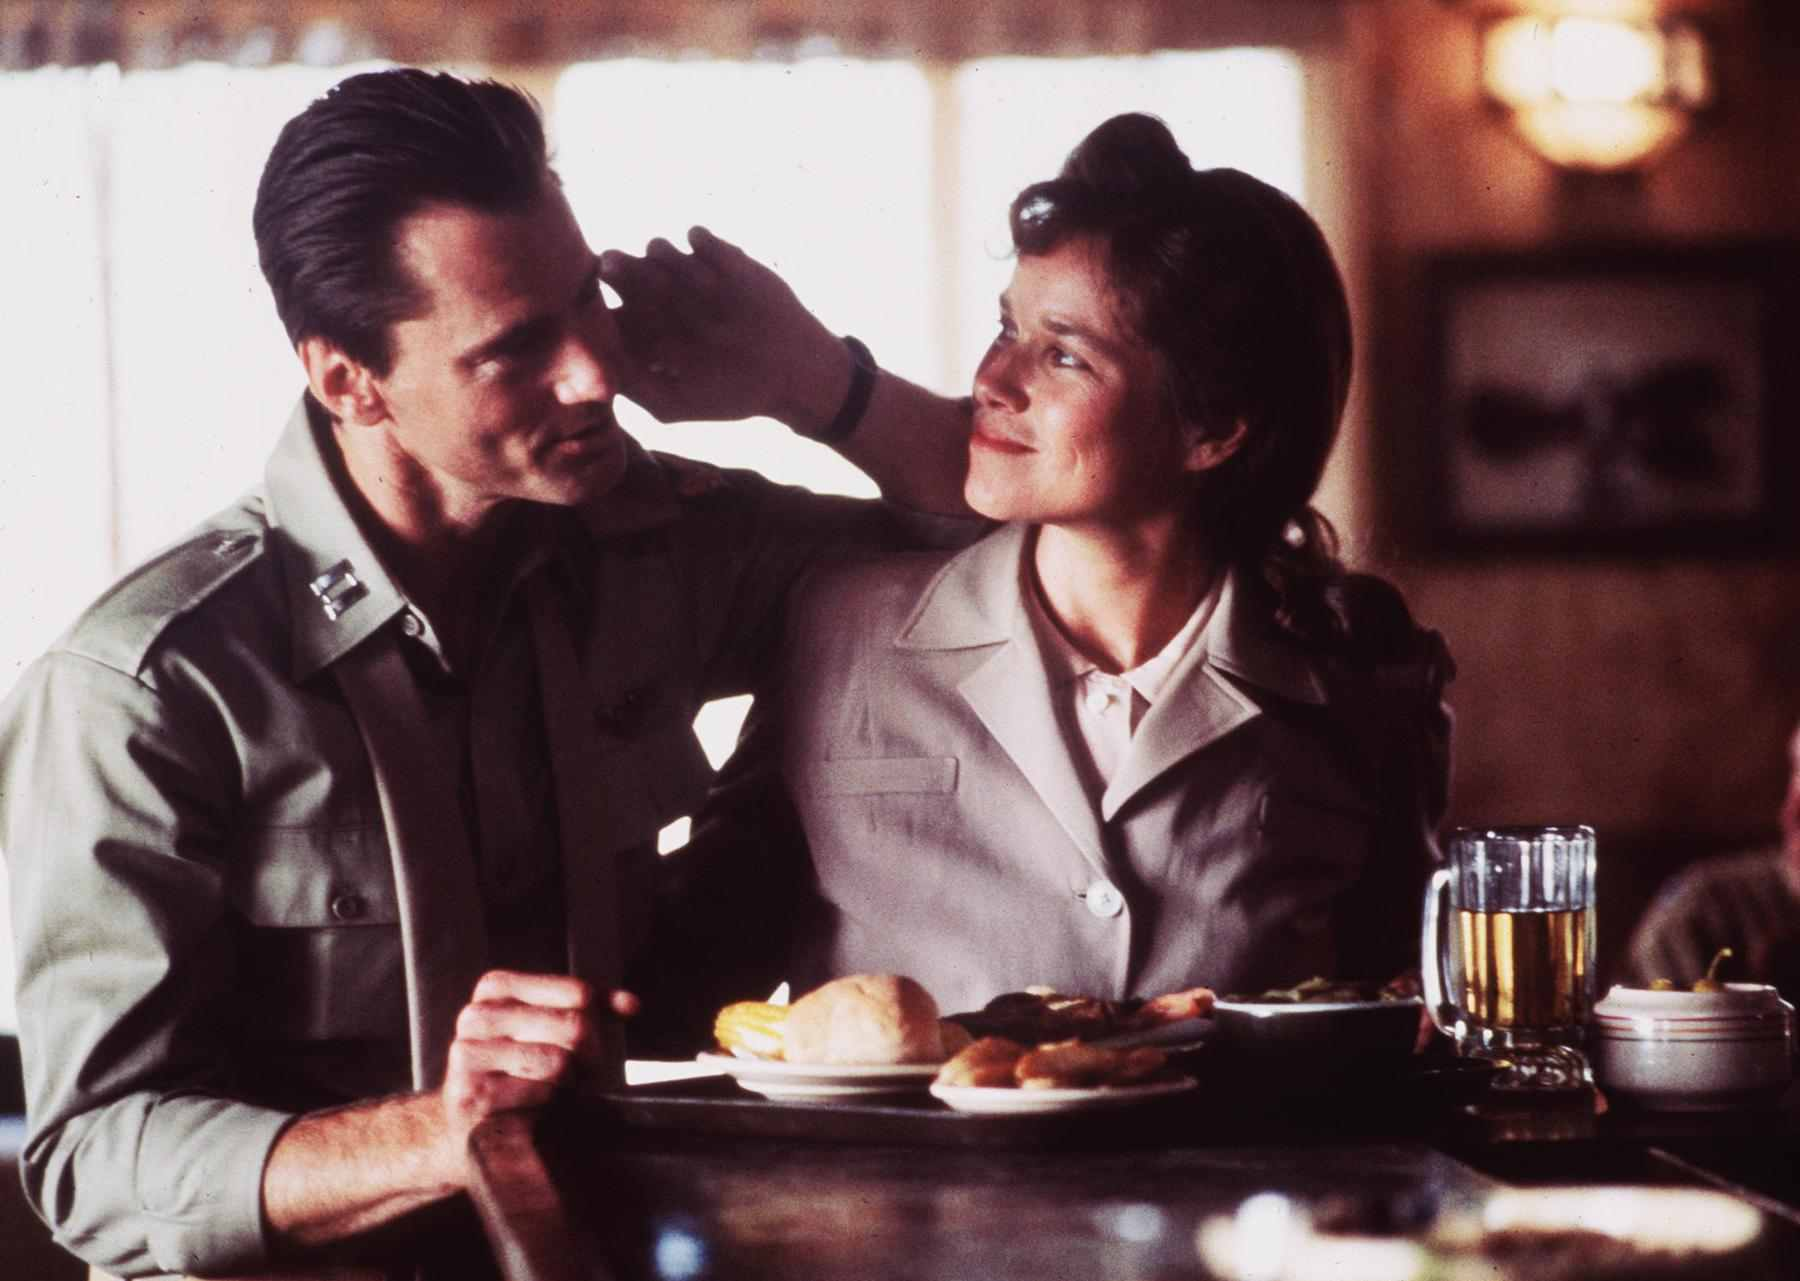 Barbara Hershey and Sam Shepard in The Right Stuff (1983)